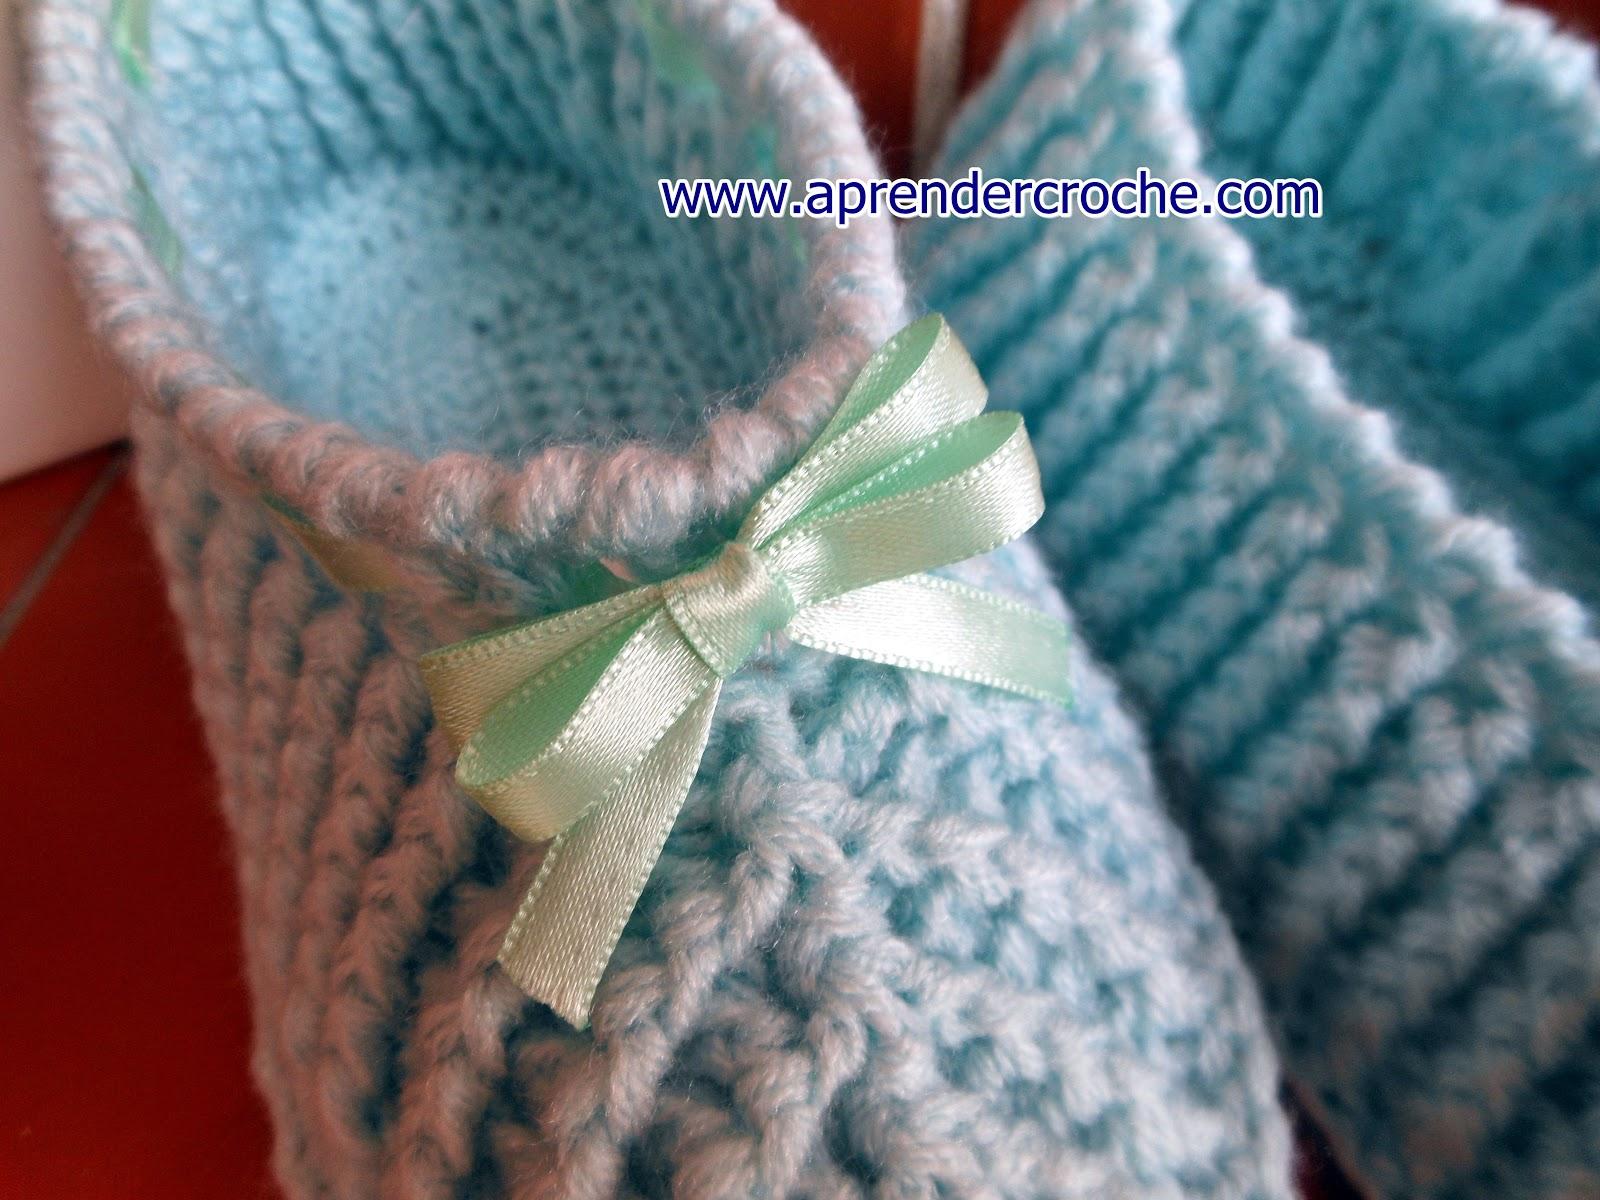 Pantufas em croche amore baby - aprender croche Curso Edinir Croche Aprender Croche